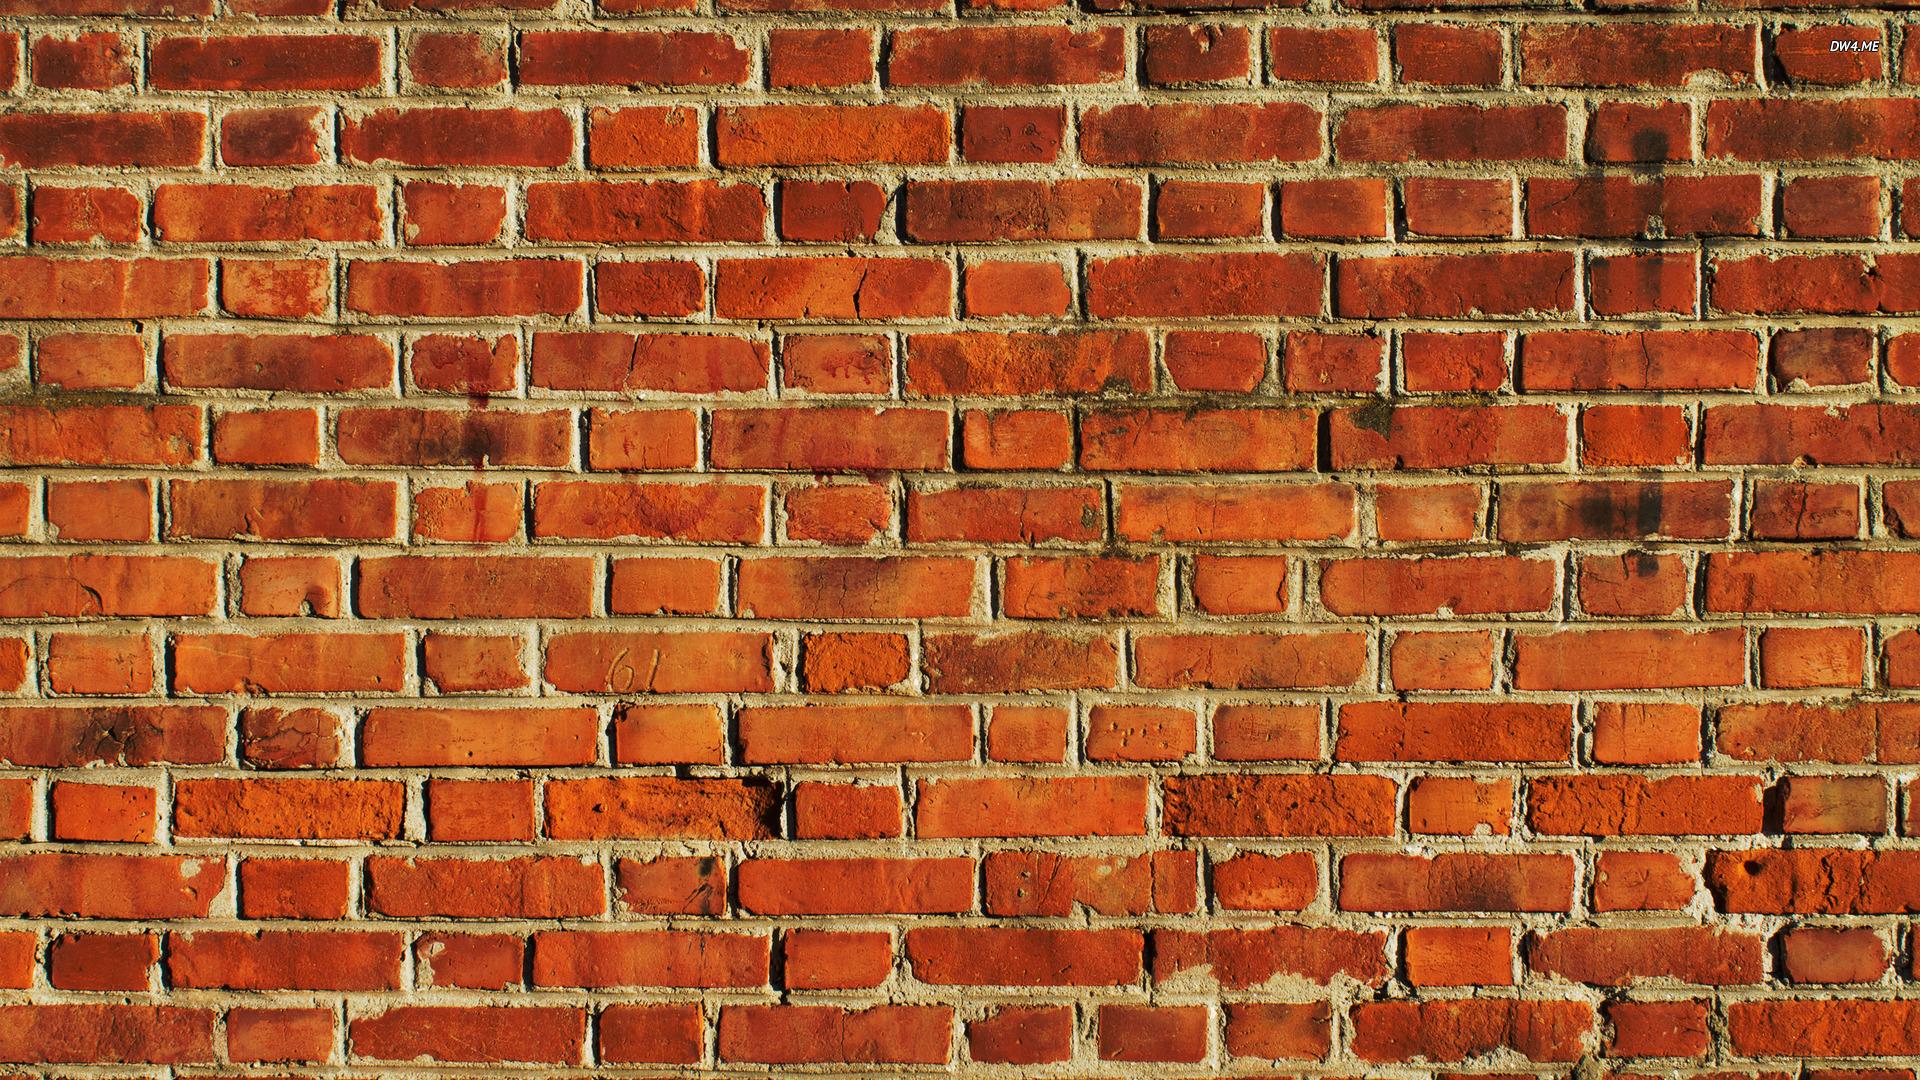 wallpaper for brick wall 2015   Grasscloth Wallpaper 1920x1080